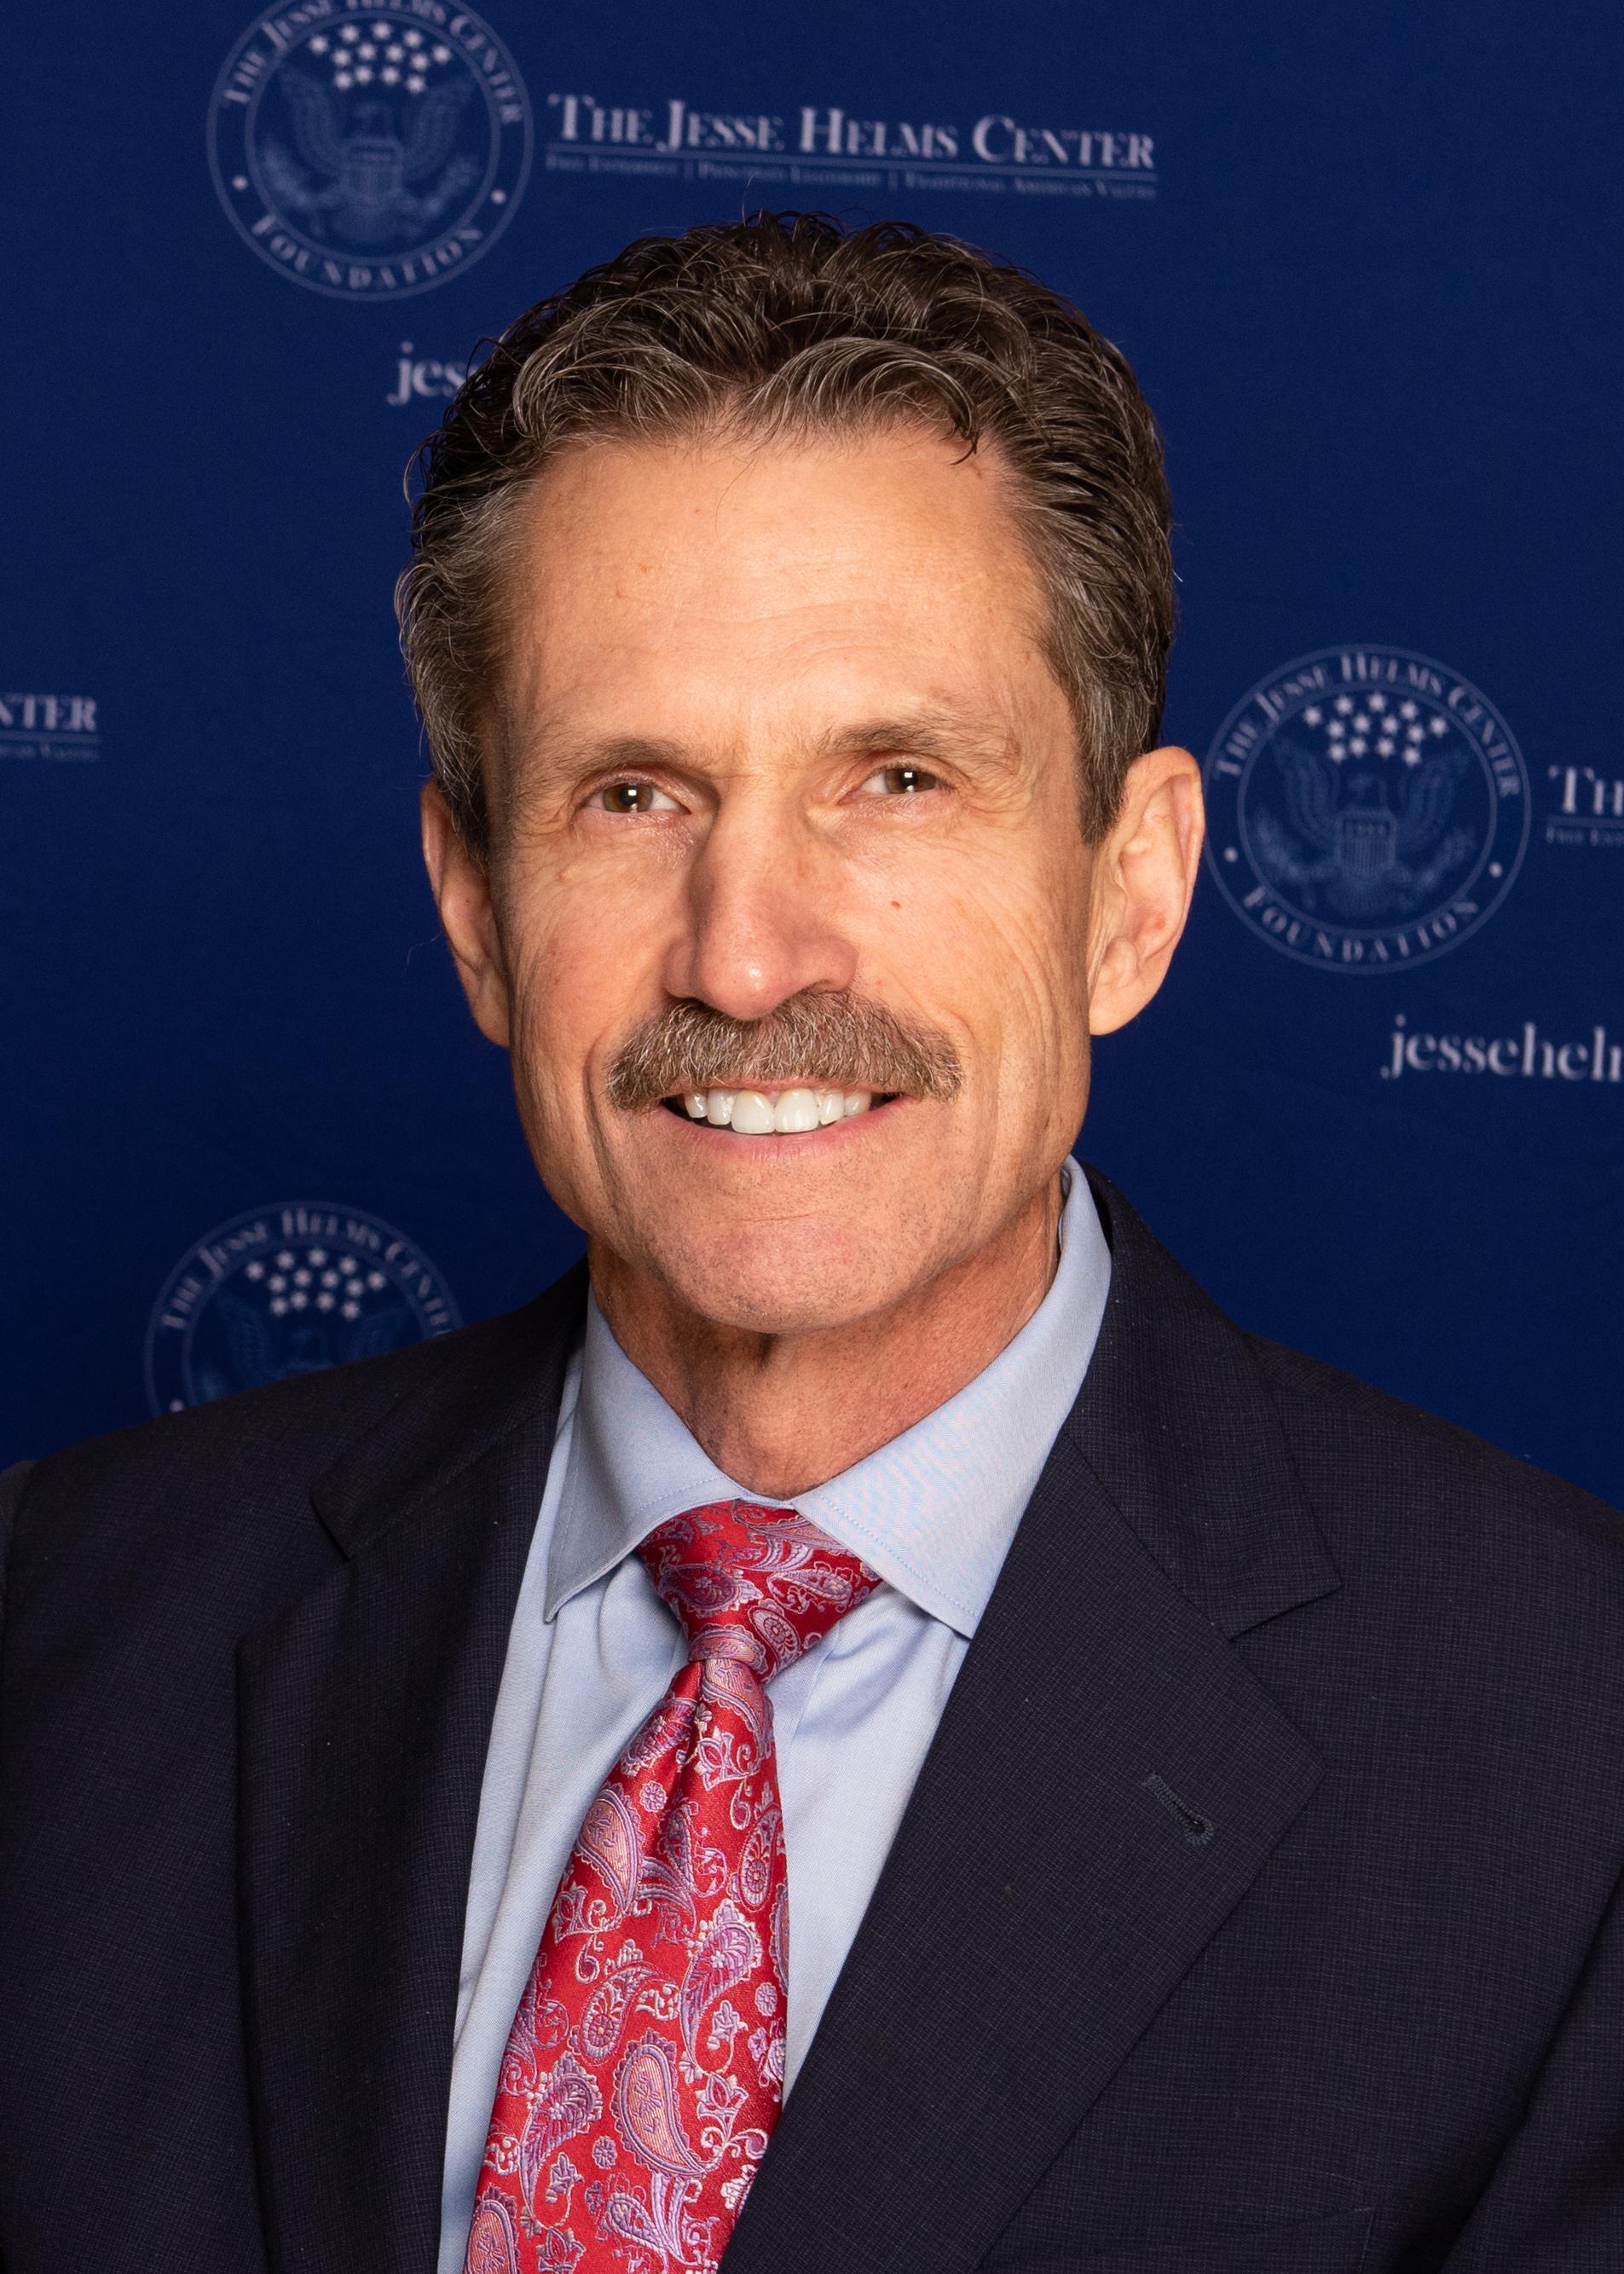 John Dodd   President Emeritus of the Jesse Helms Center, Creator of the Free Enterprise Leadership Challenge